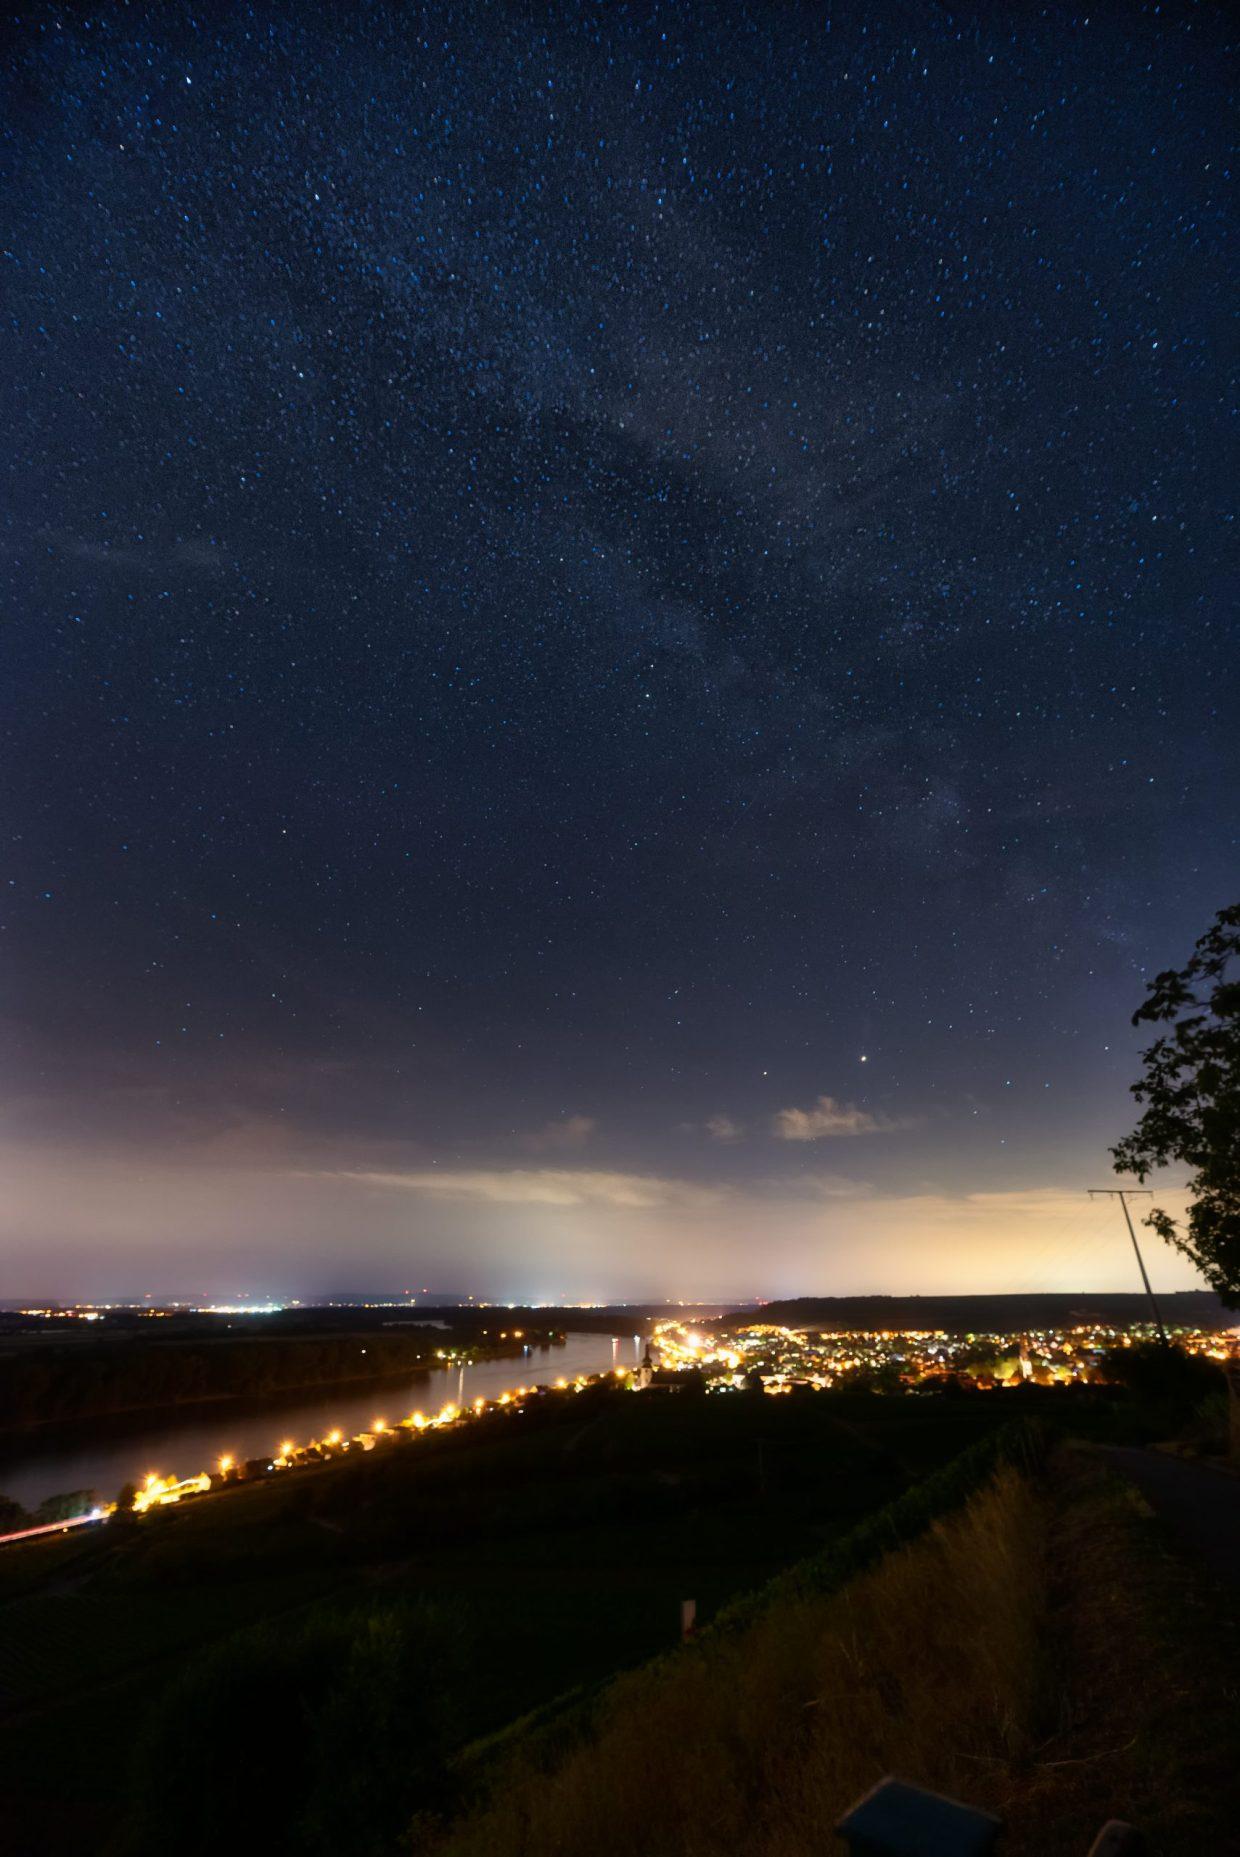 Die Milchstraße über Nierstein. (Foto: Andreas Lerg)